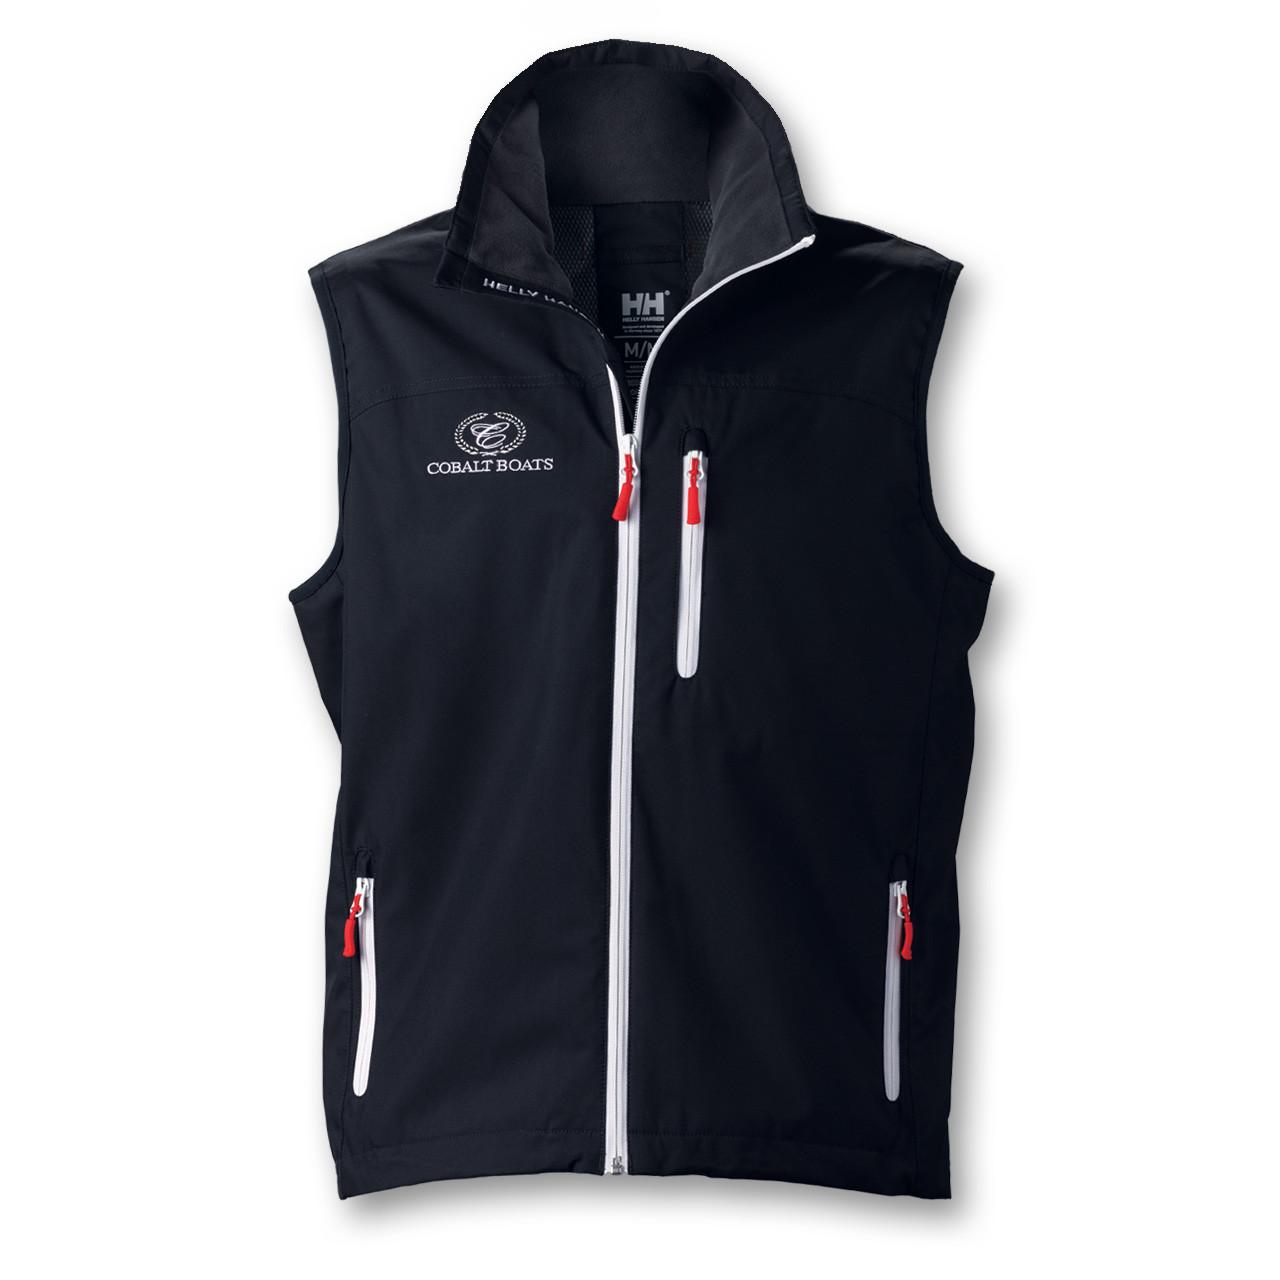 e6bdd95c07 Helly Hansen Full Zip Vest - Cobalt Sportswear